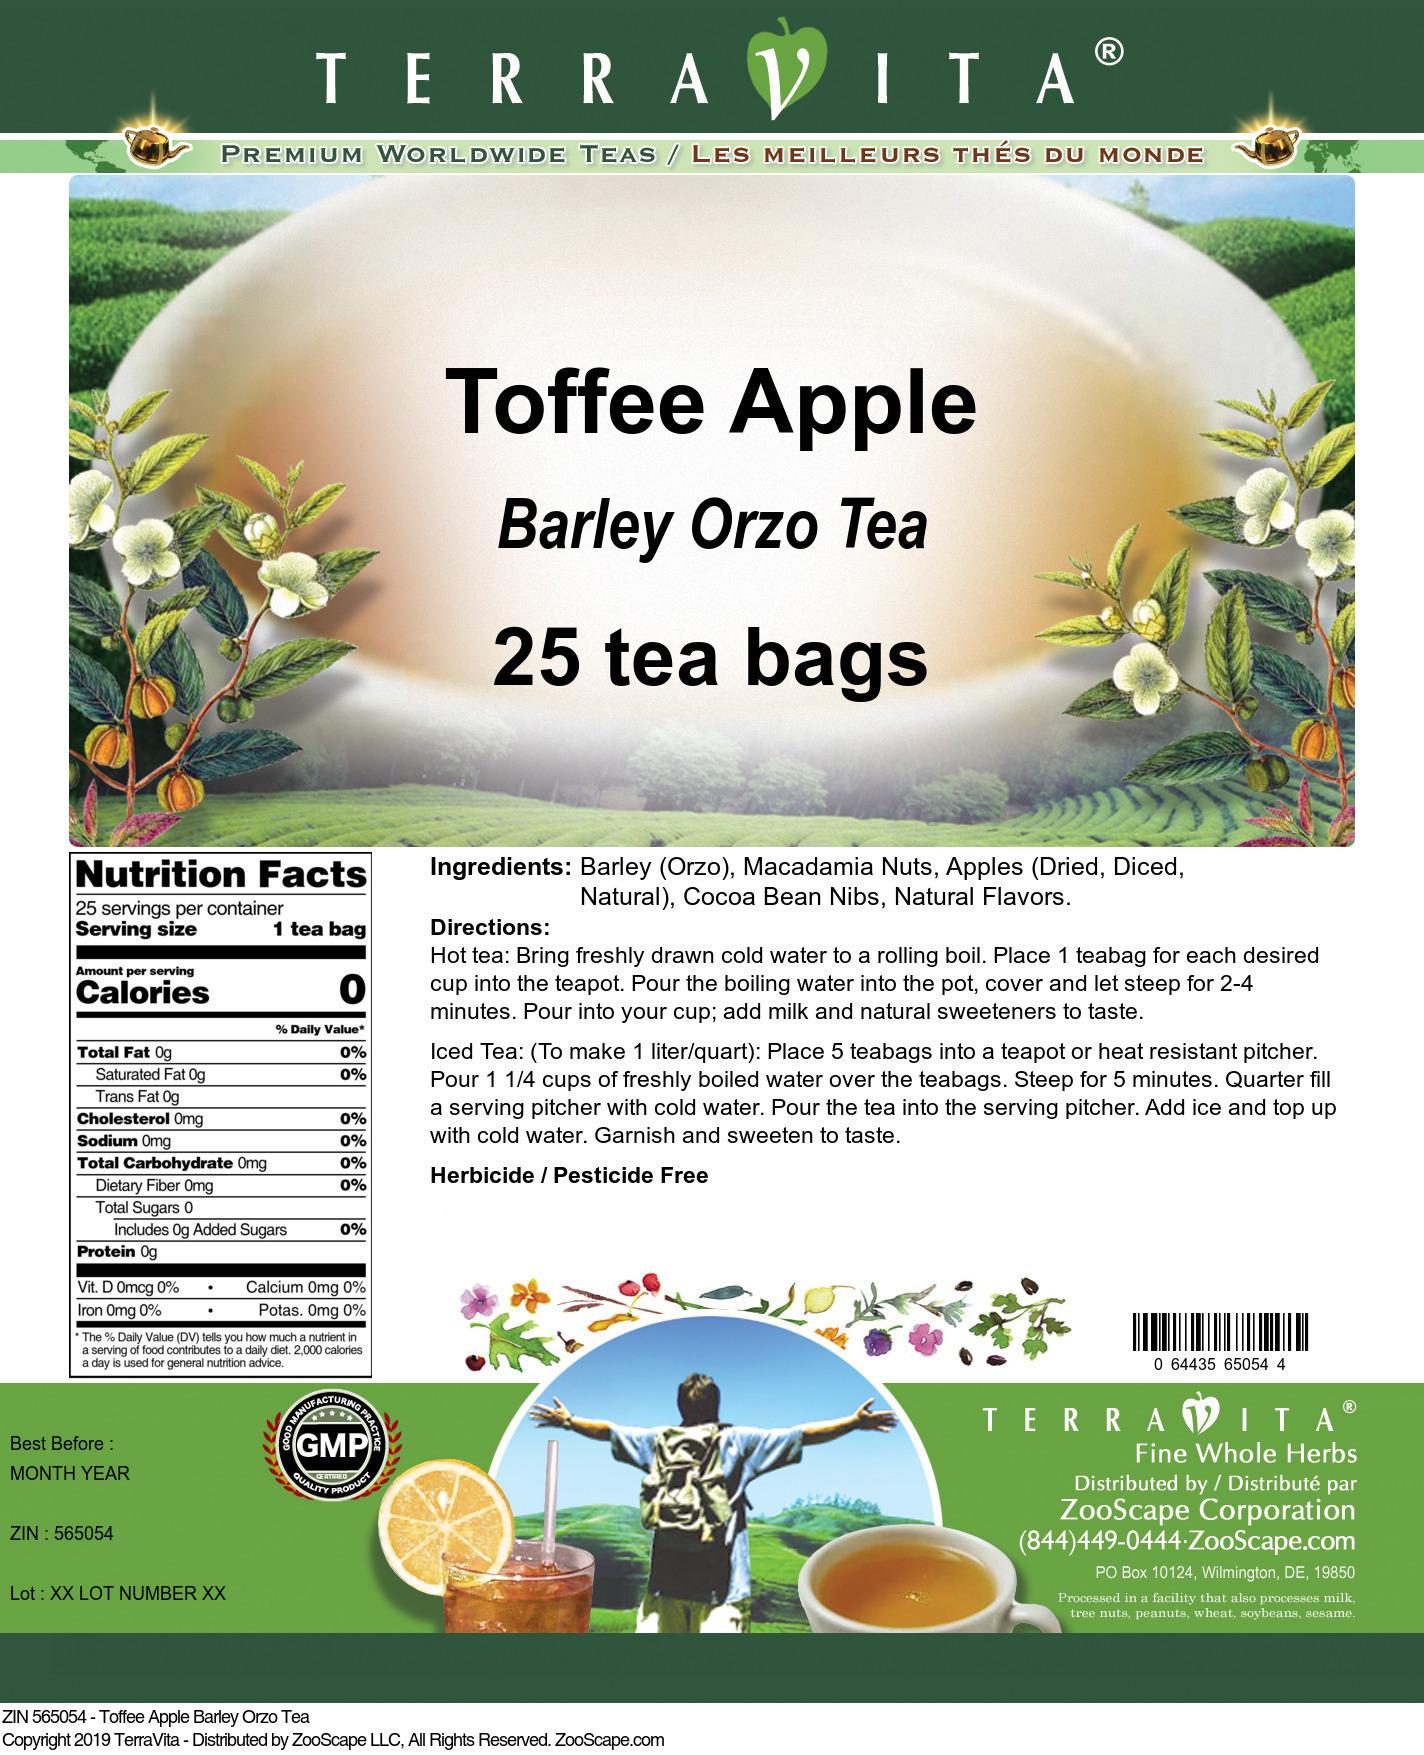 Toffee Apple Barley Orzo